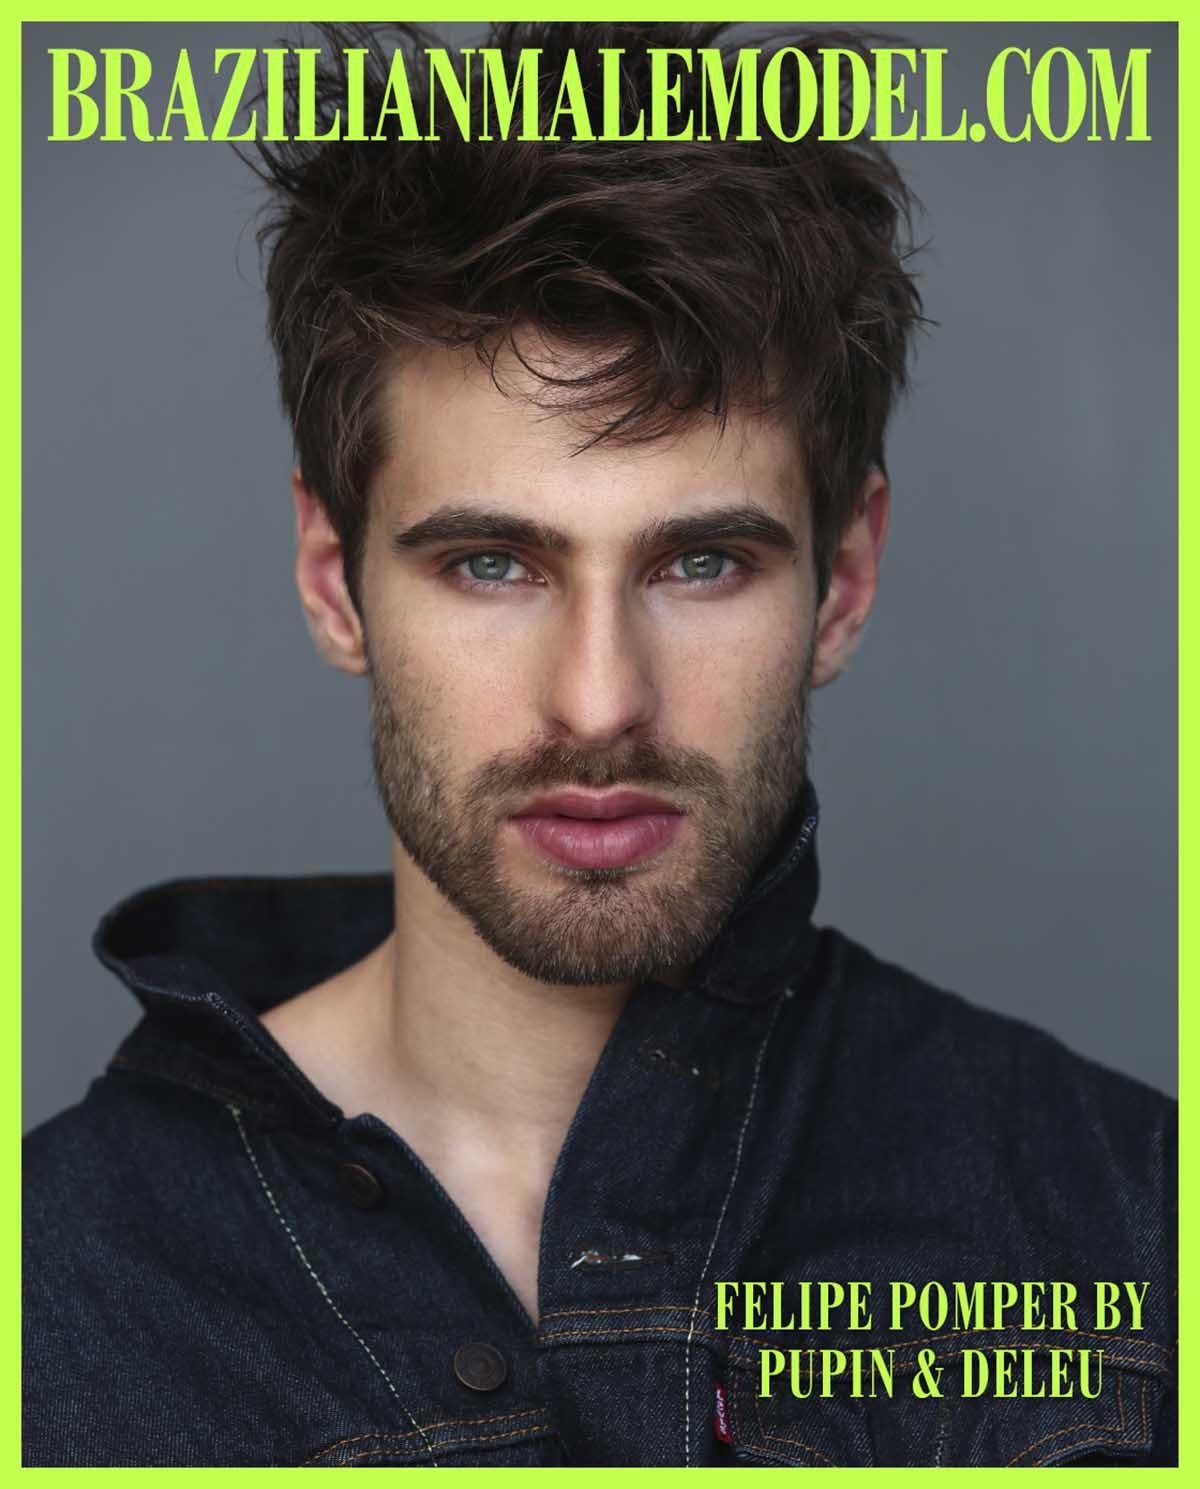 Felipe Pomper by Pupin & Deleu